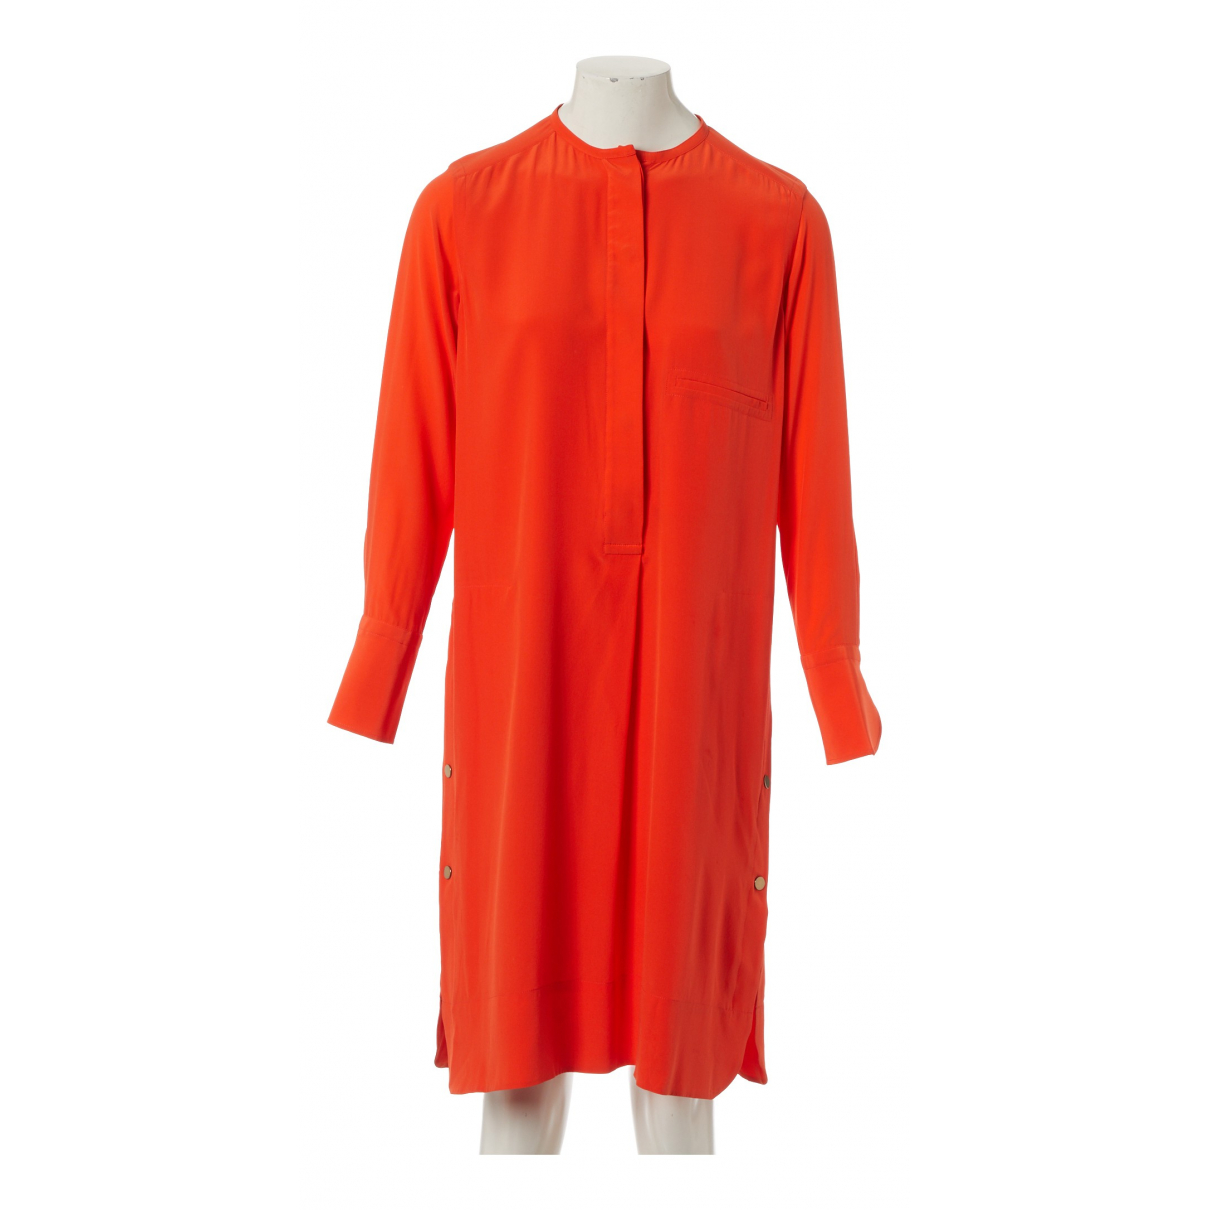 Hermès N Orange Silk dress for Women 36 FR